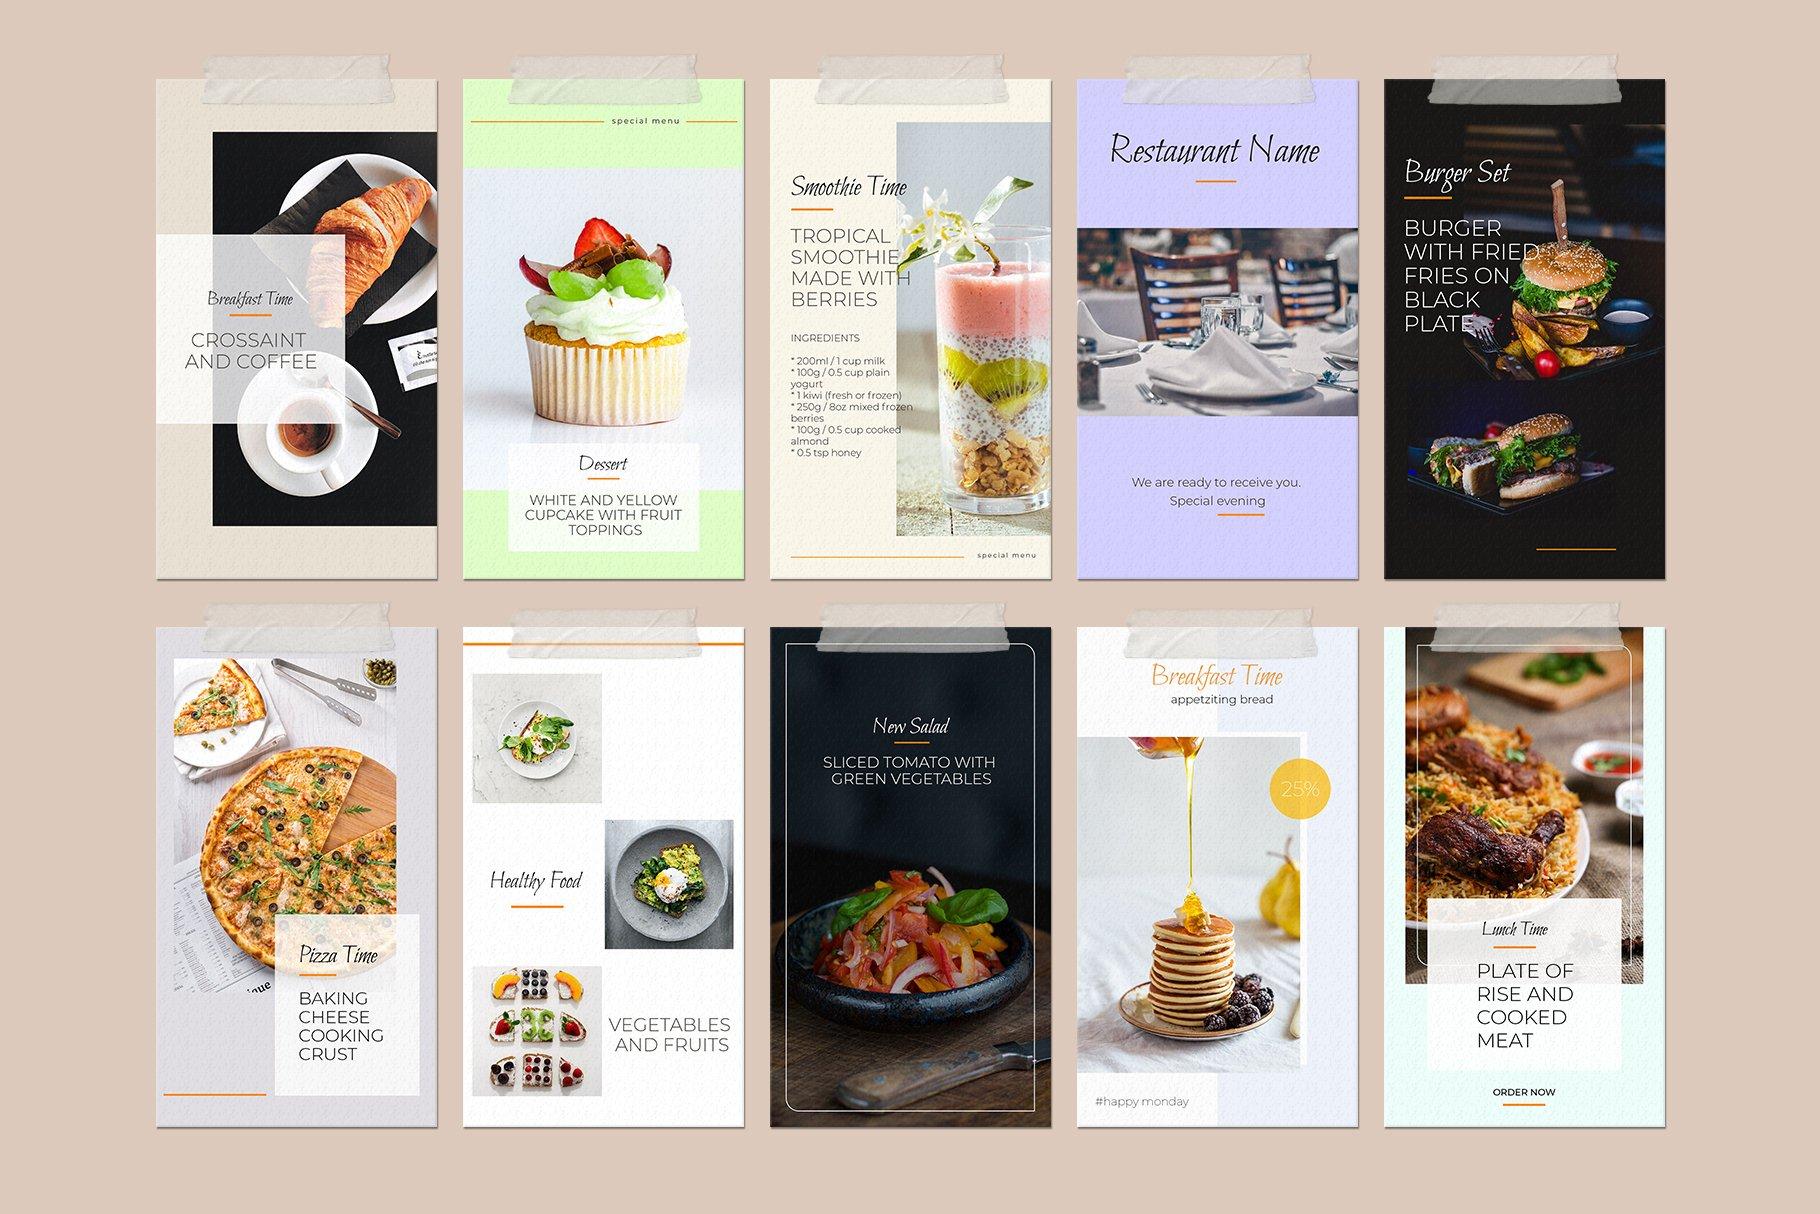 restaurant presentation 3 3